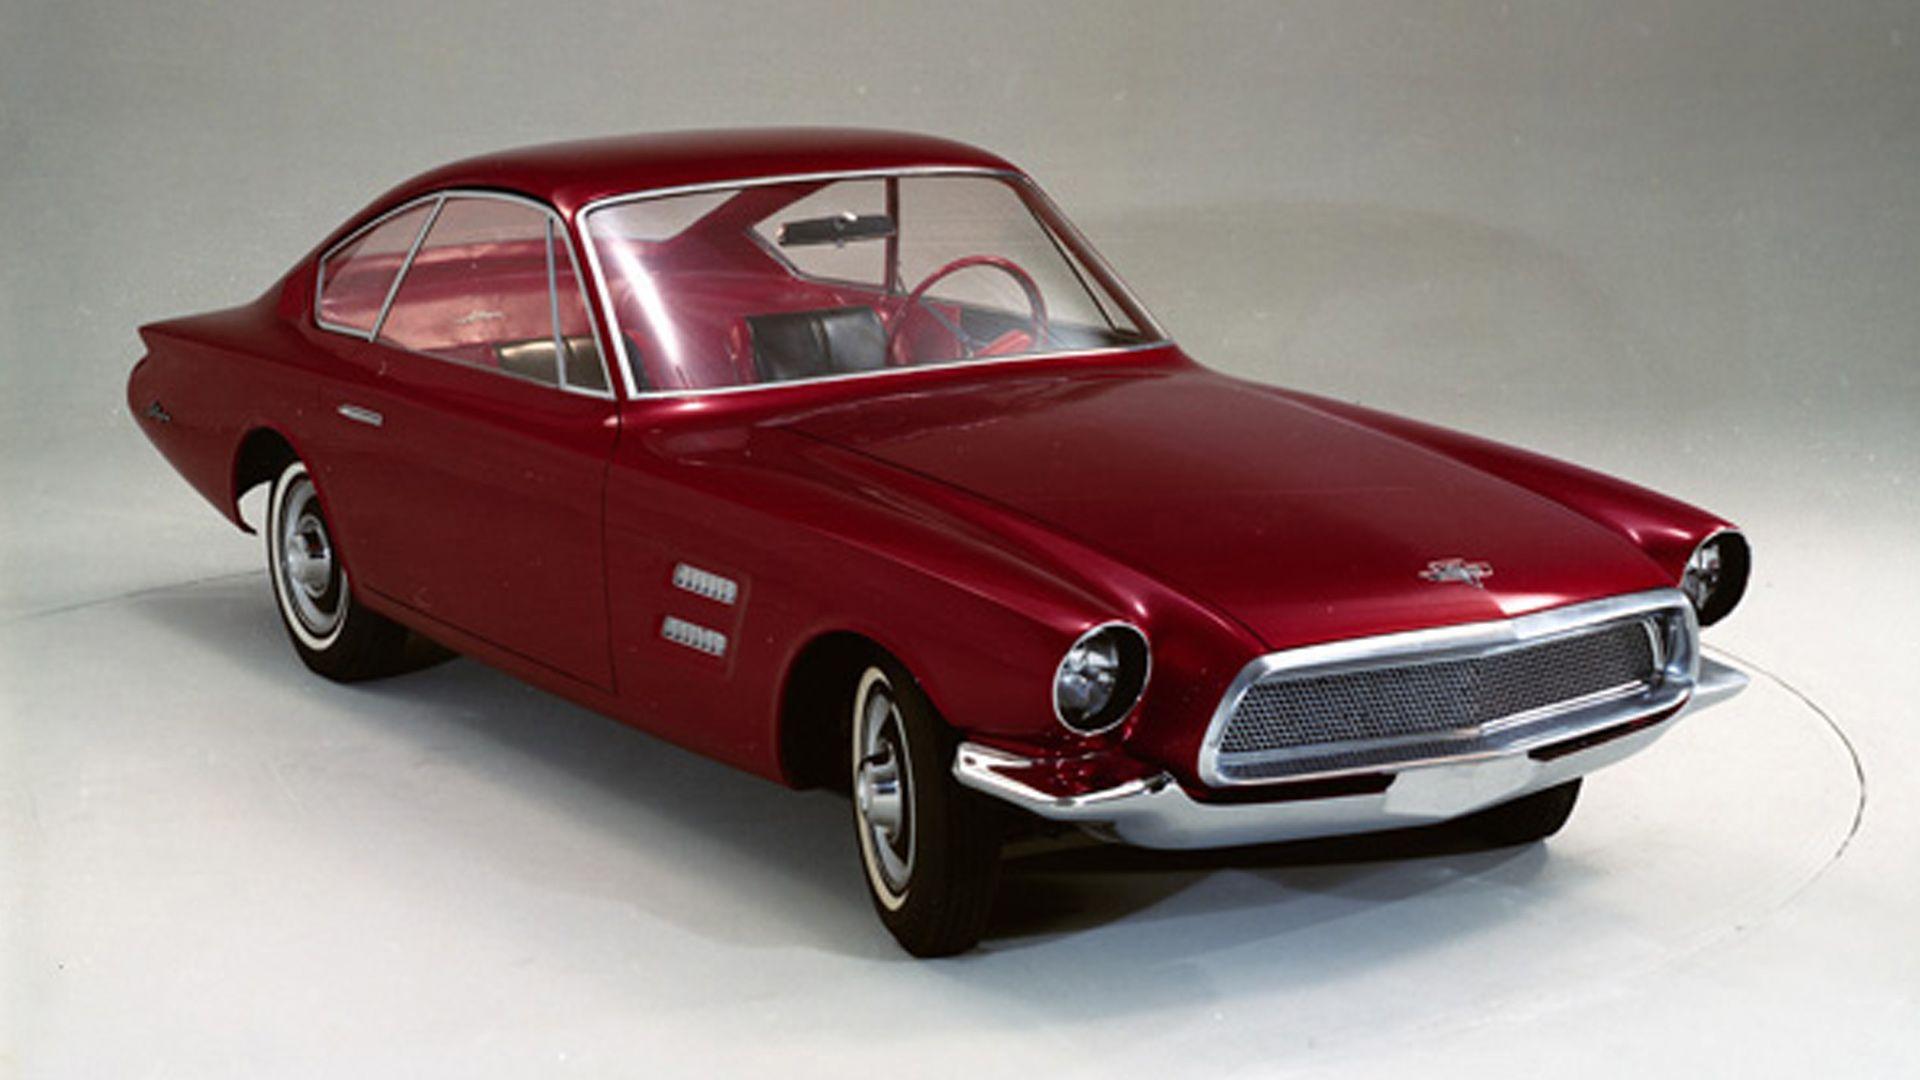 1962 Allegro Concept Concept Cars Car Ford Vintage Concepts